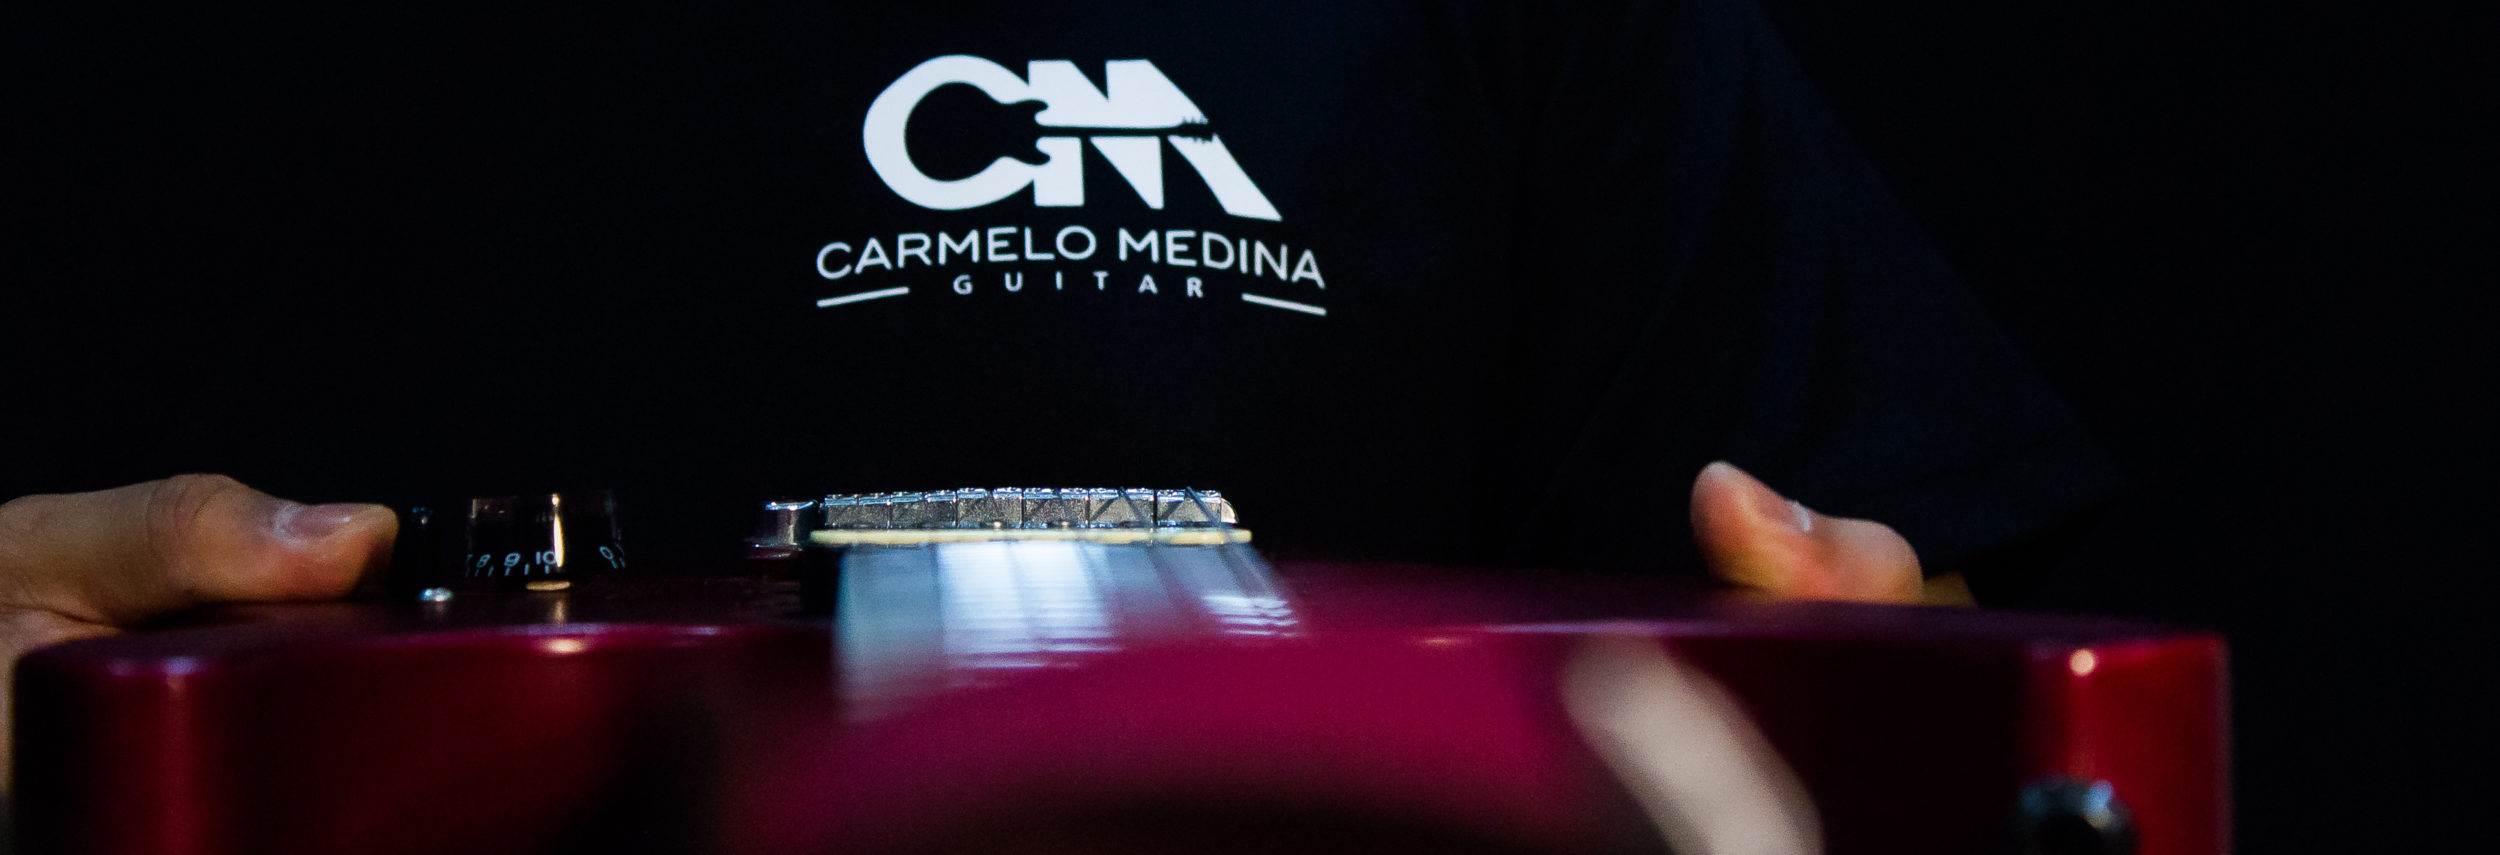 Carmelo Medina Guitar